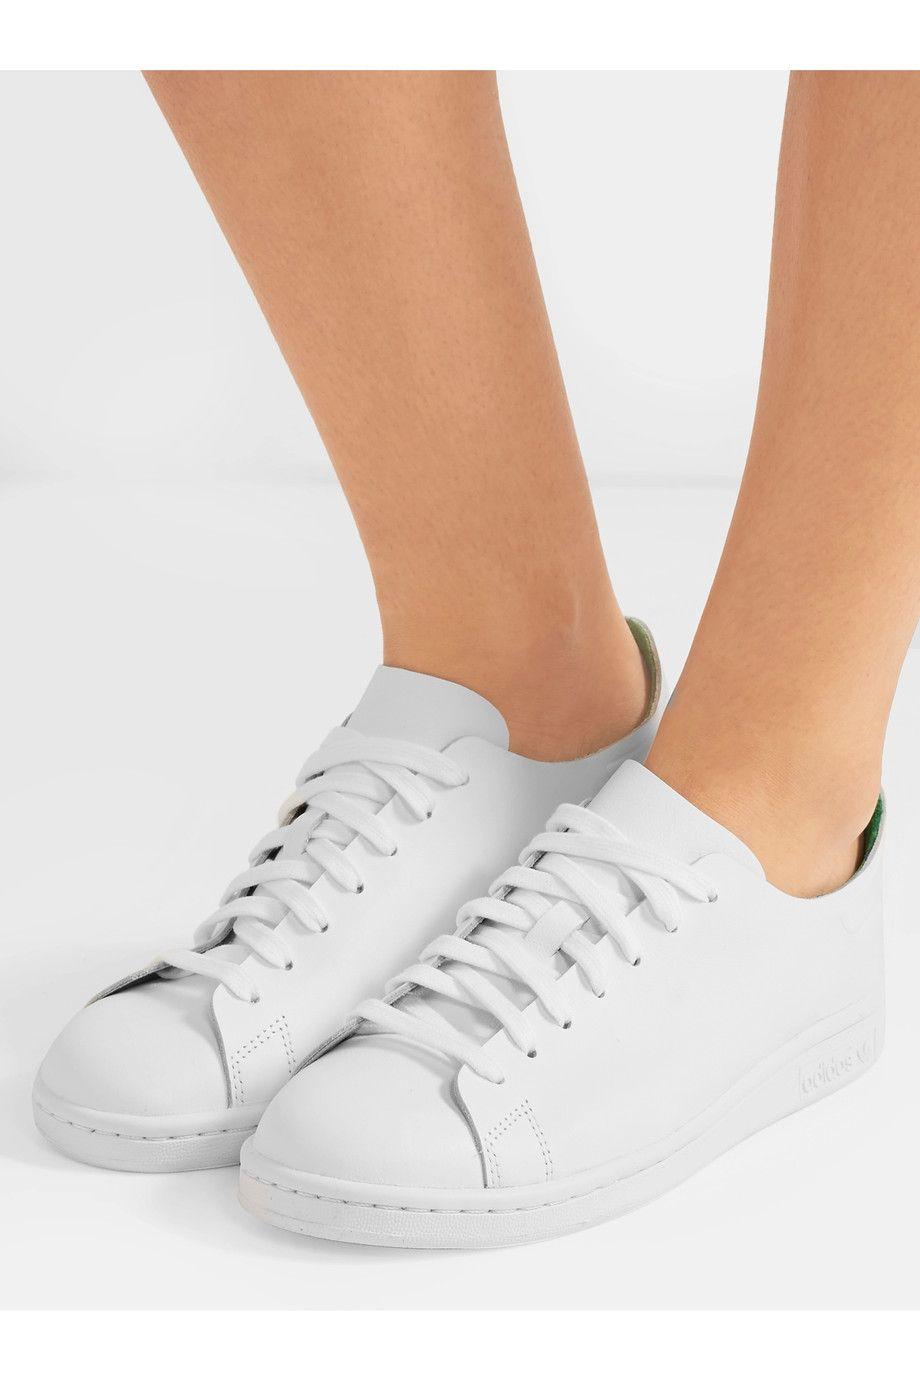 adidas stan smith nuda pelle scarpe originali netto porter